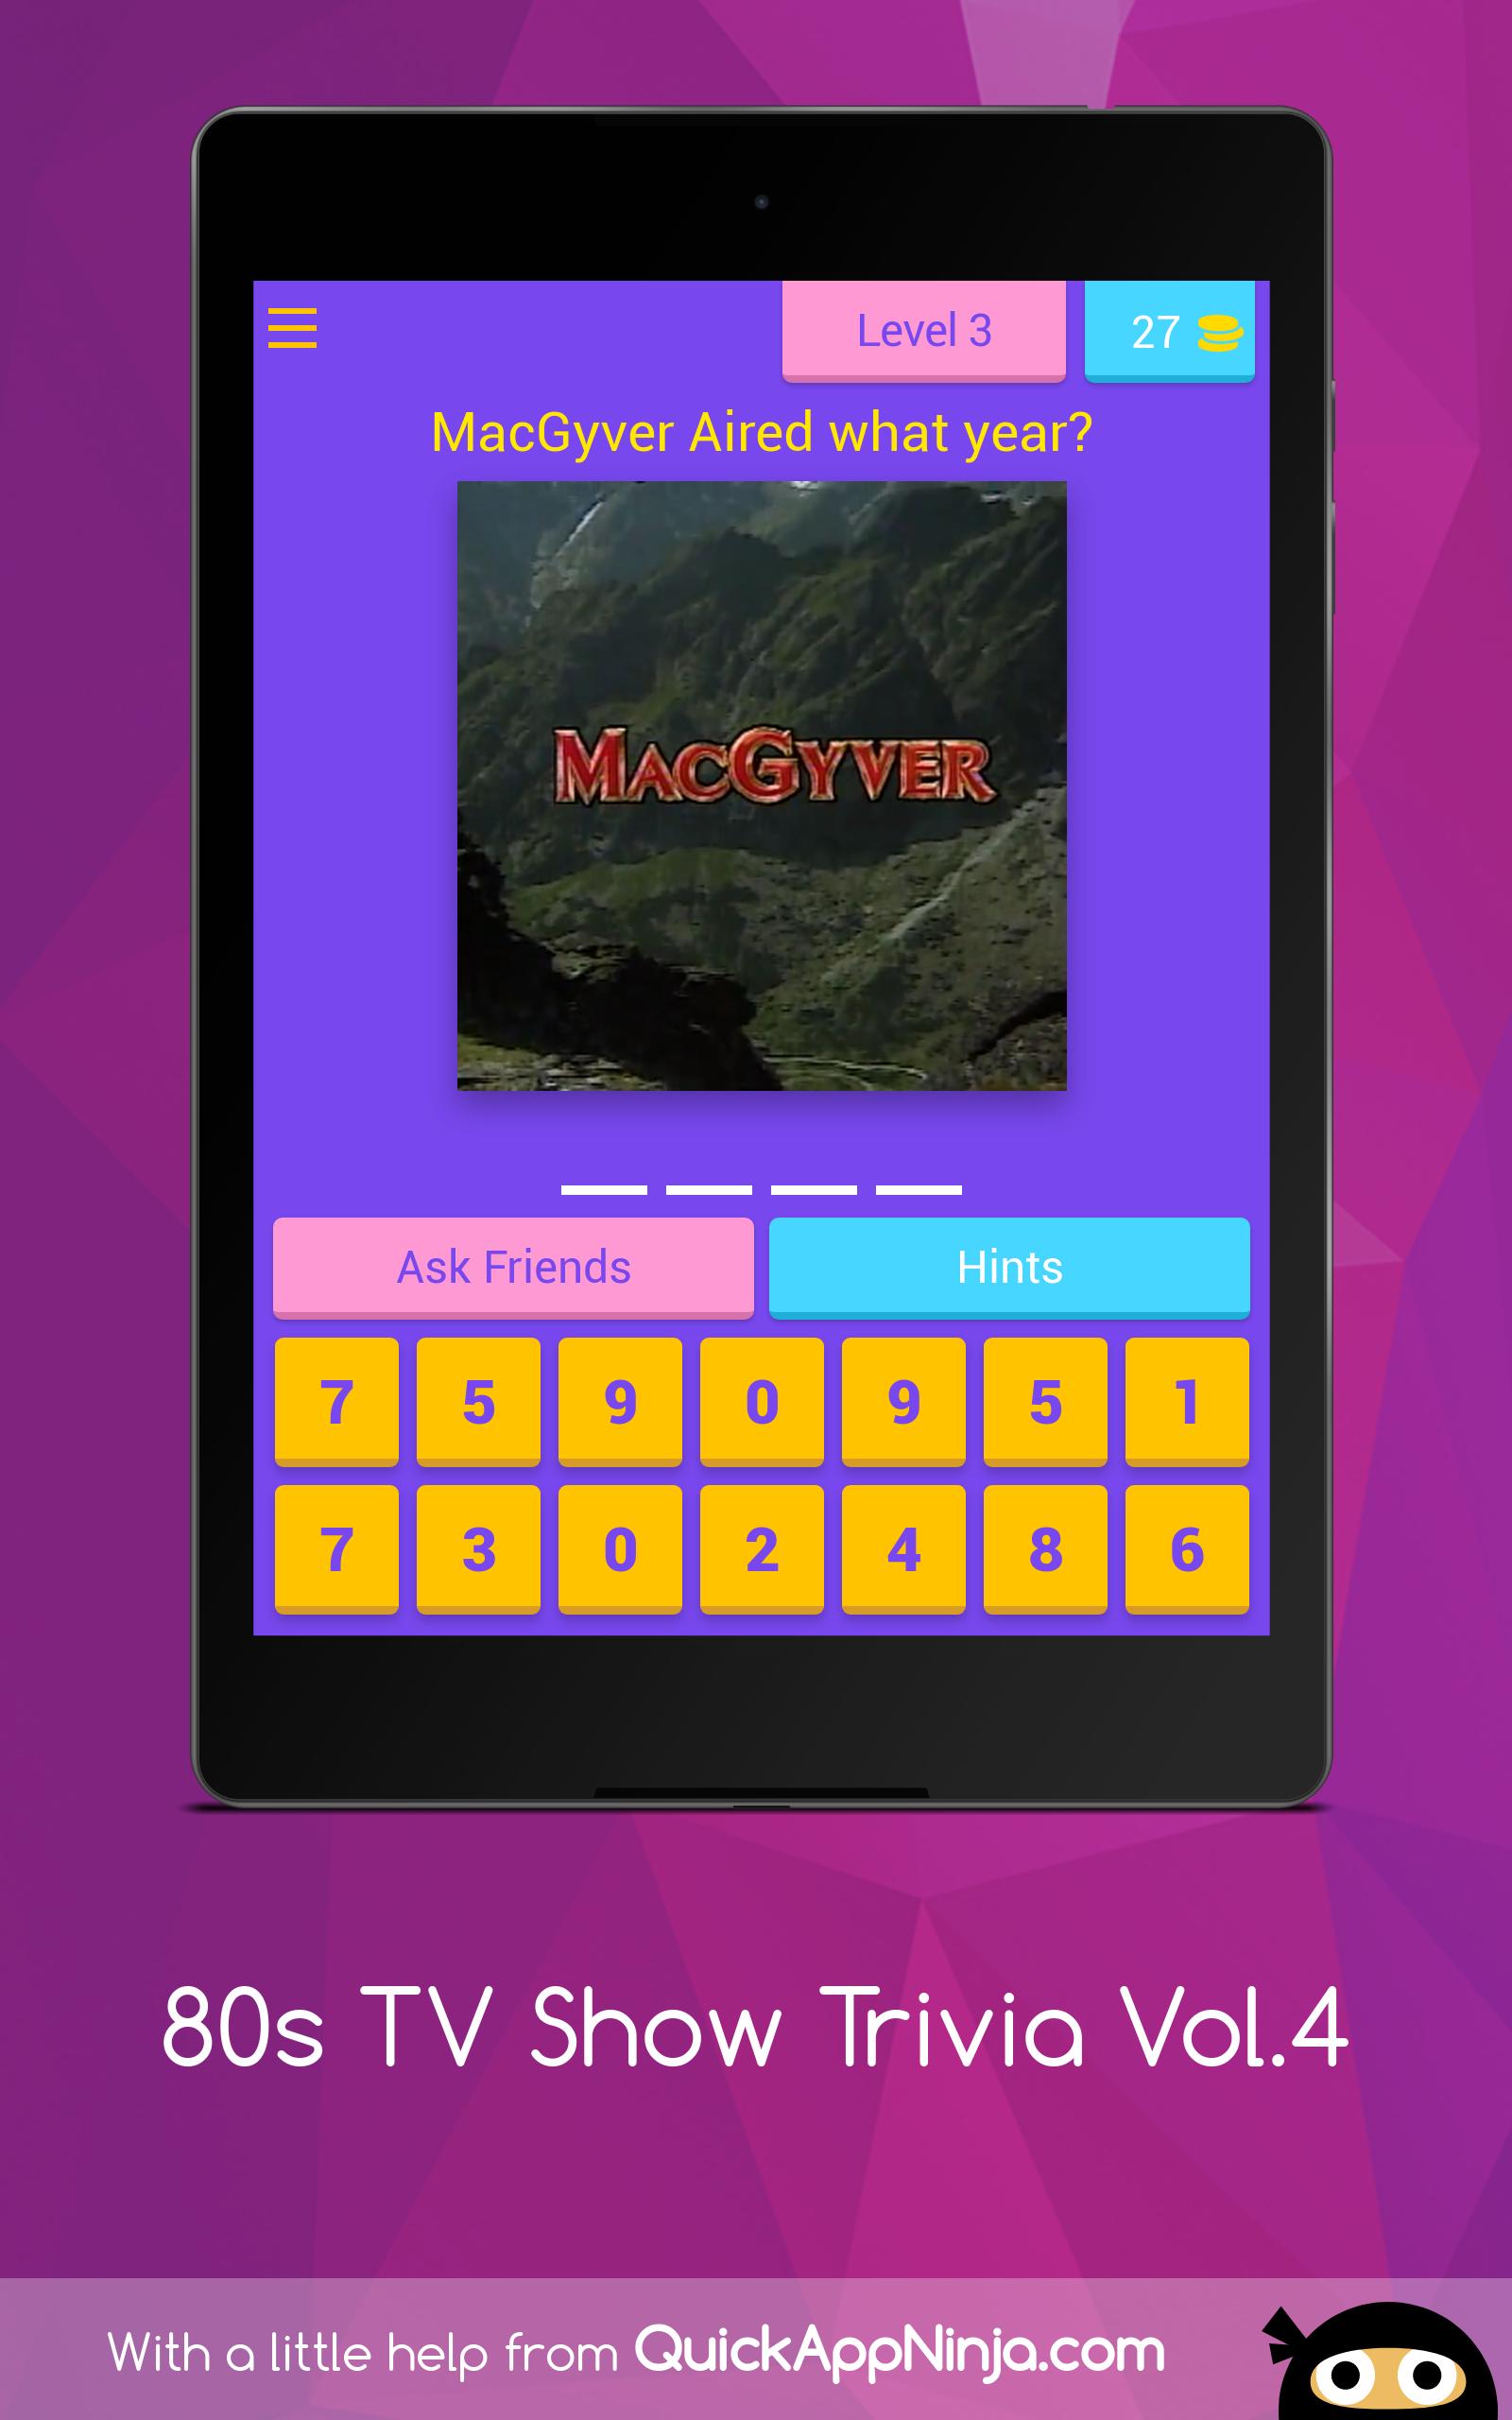 80s TV Show Trivia Vol.4: Amazon.es: Appstore para Android